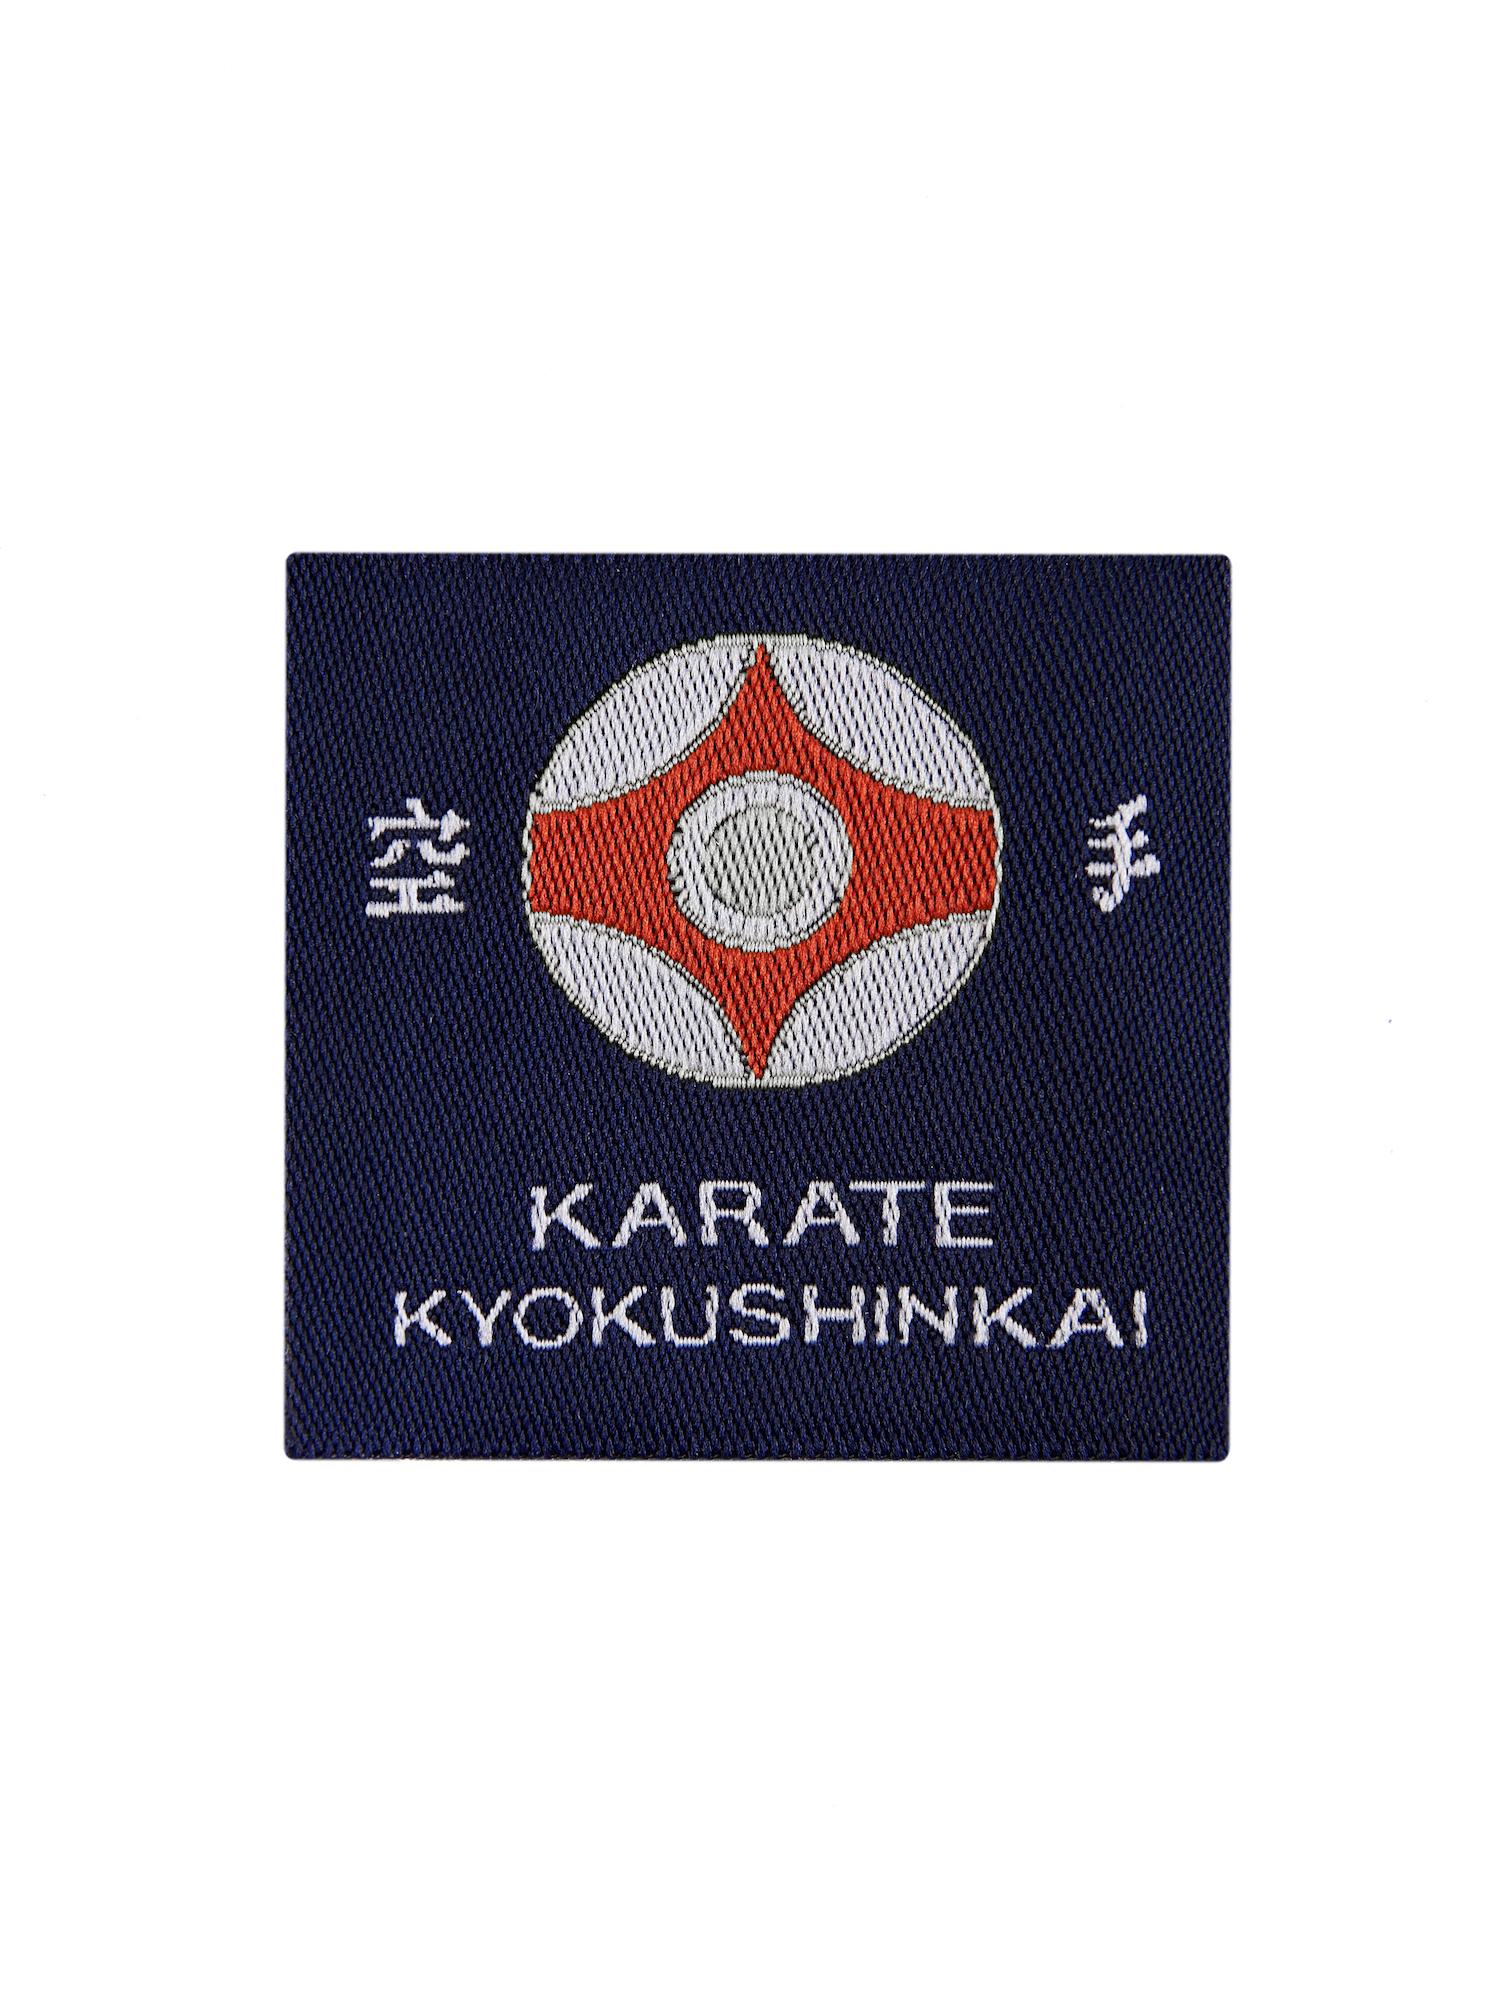 Аксессуары (брелки, шевроны, нашивки) Нашивка KYOKUSHINKAI IP-22.jpg